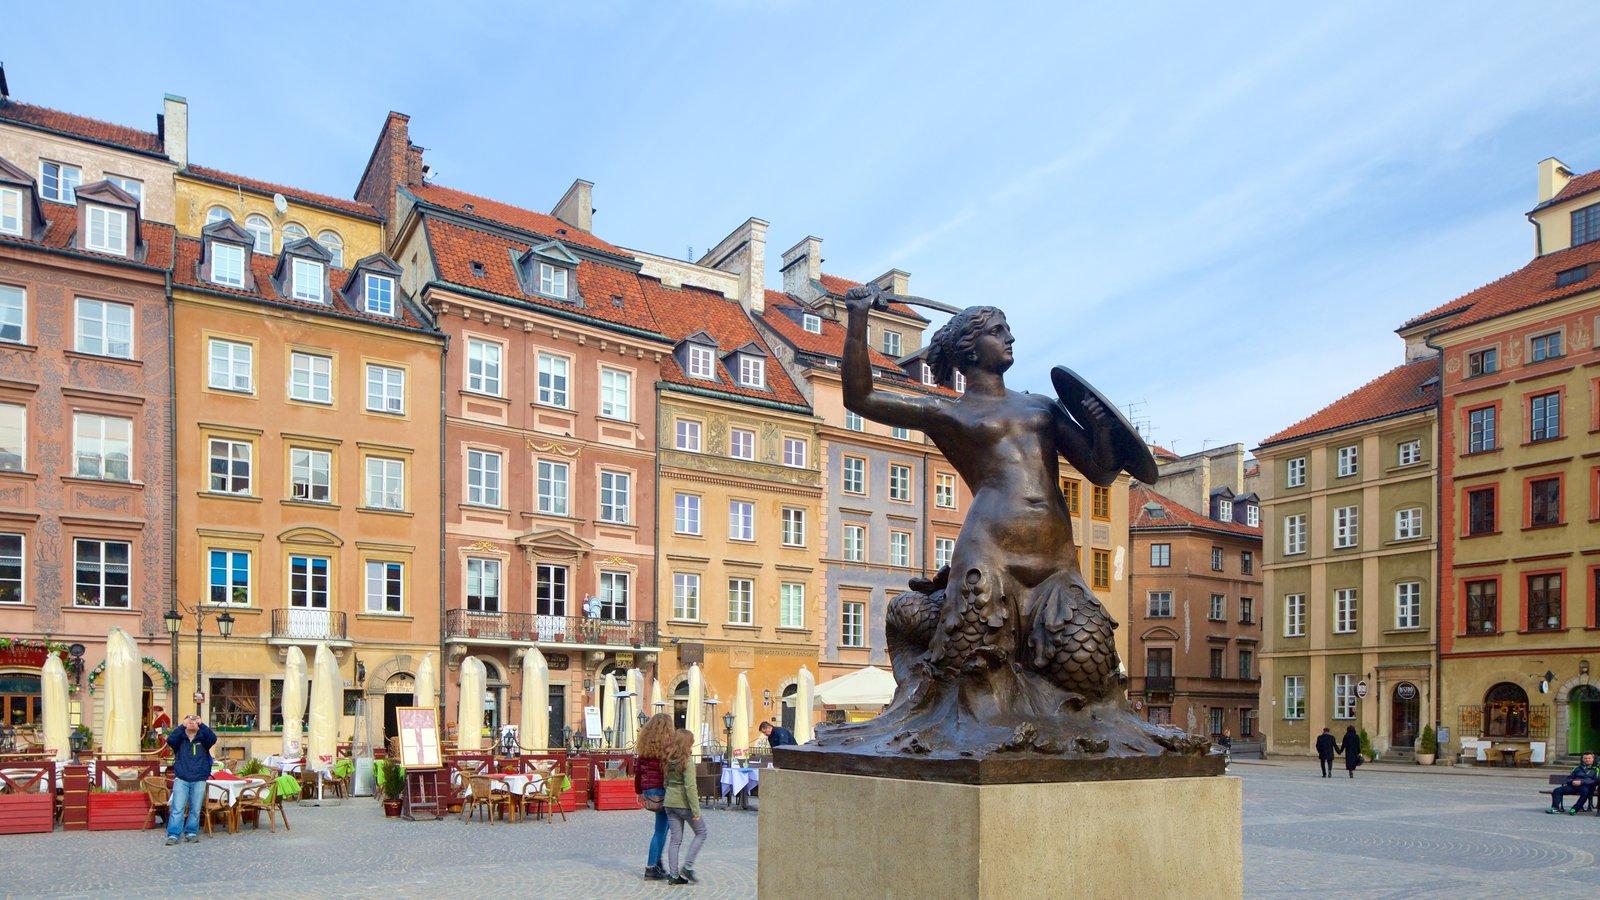 118988-Warsaw-Mermaid-Statue